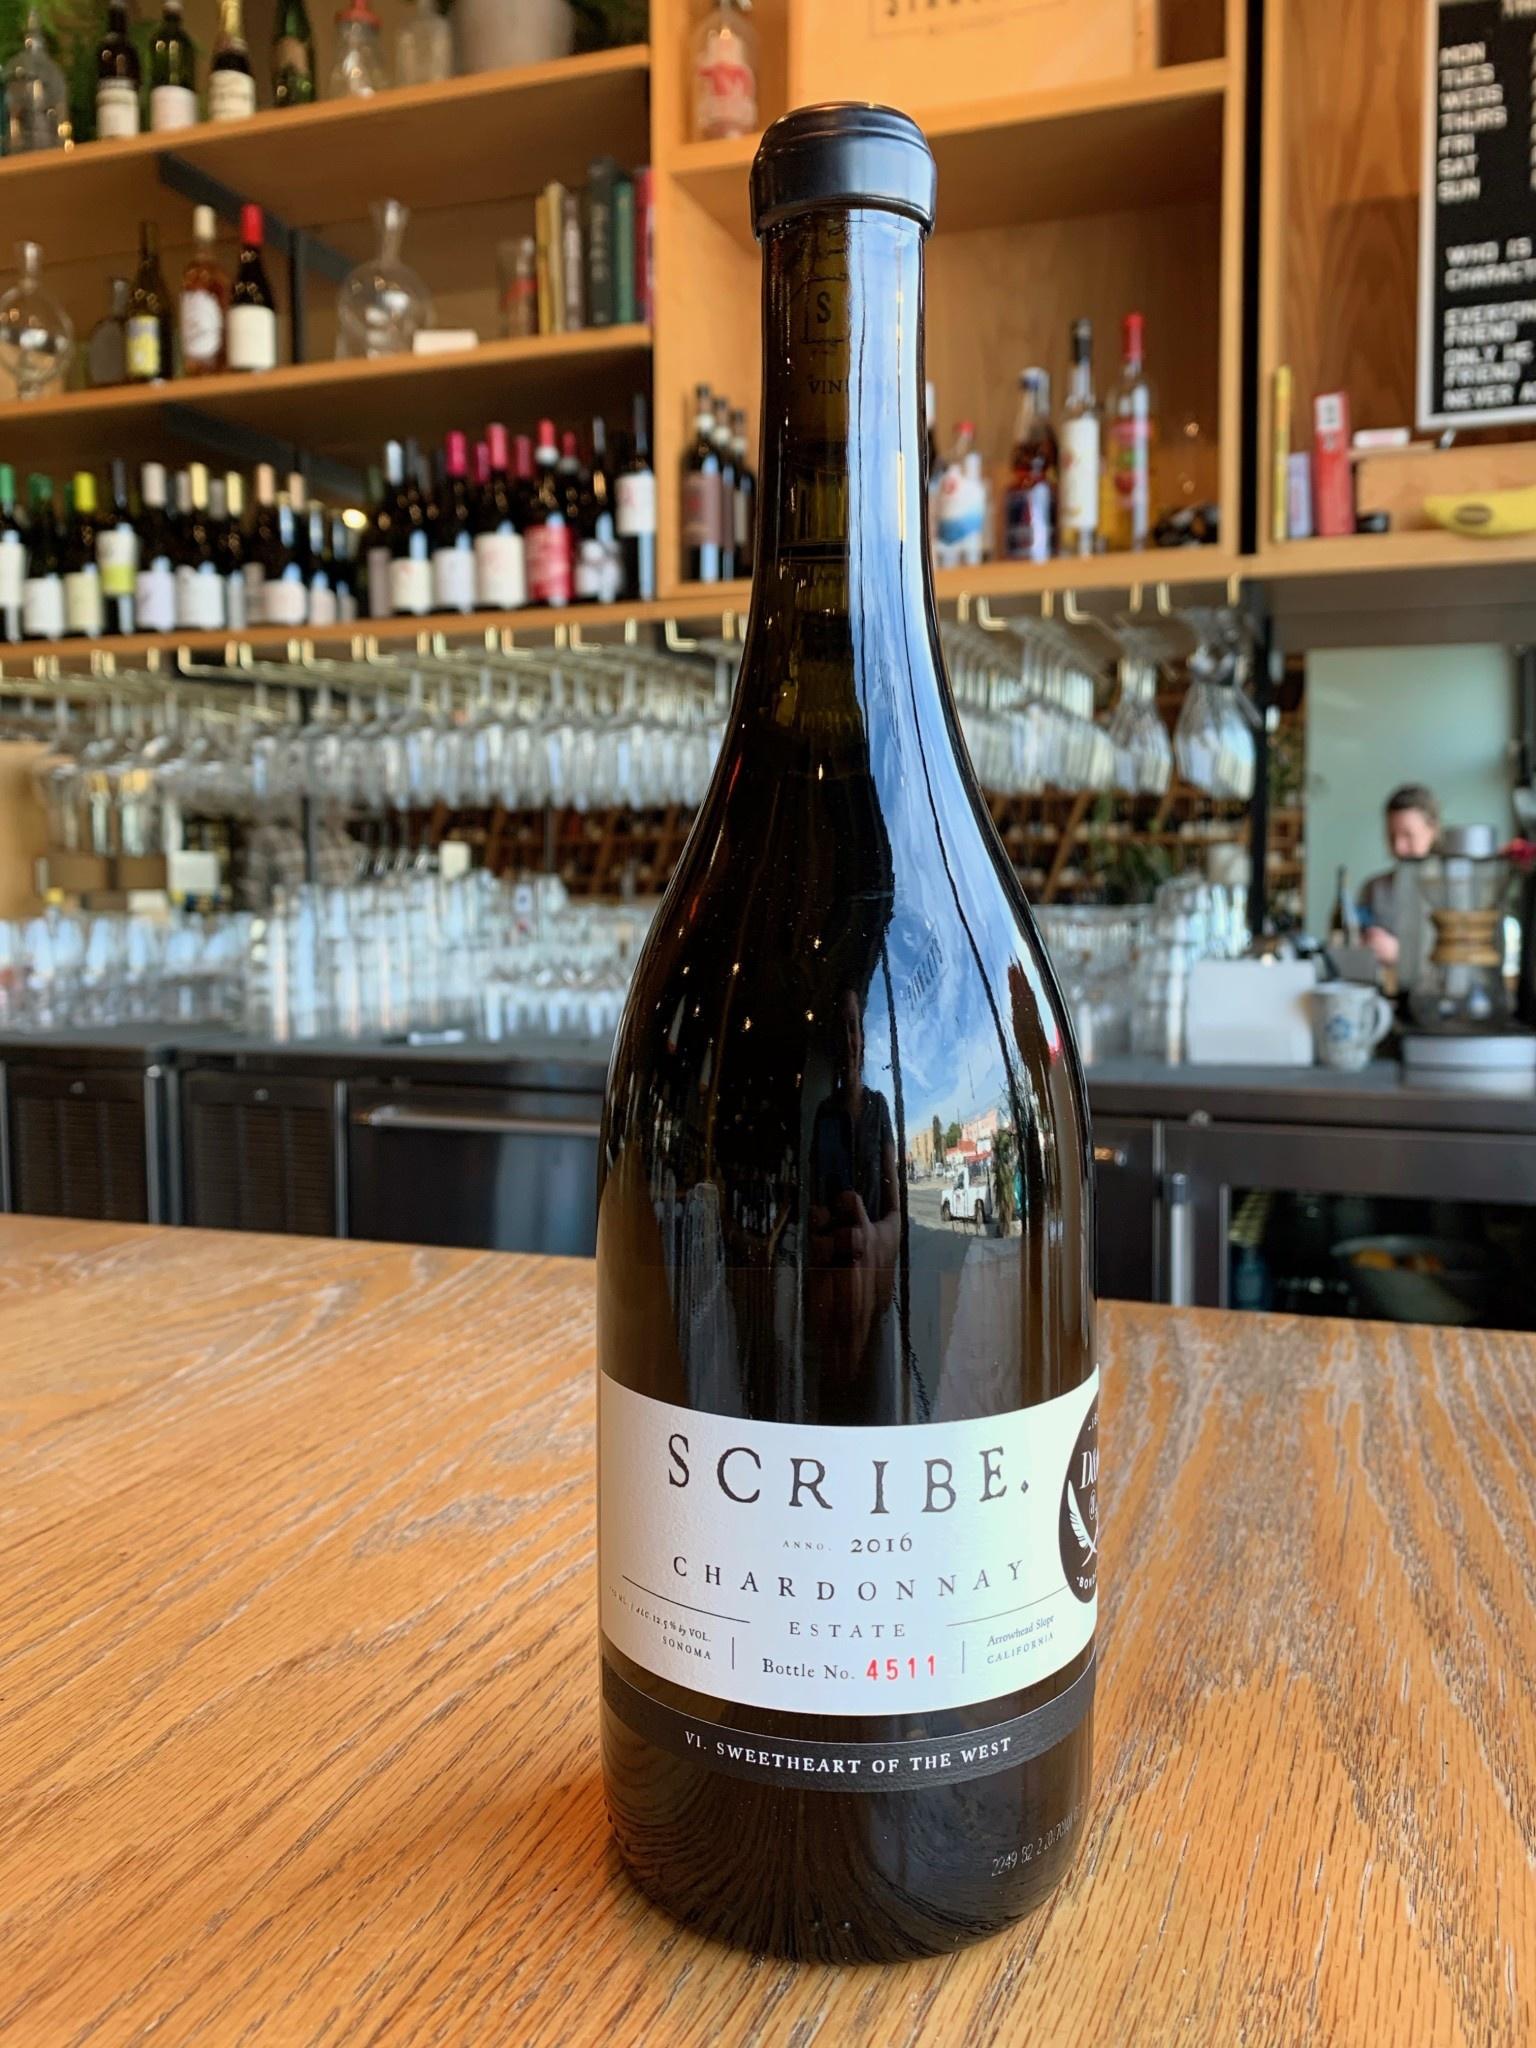 Scribe 2016 Scribe Estate Chardonnay 750mL